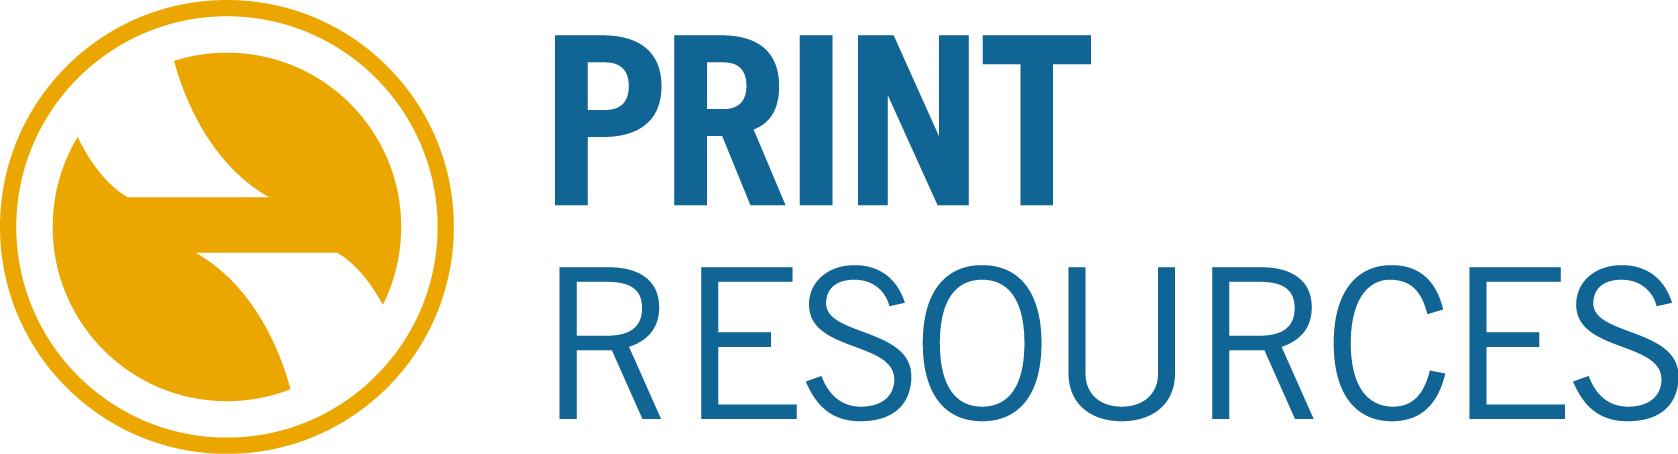 Print-Resources.jpg